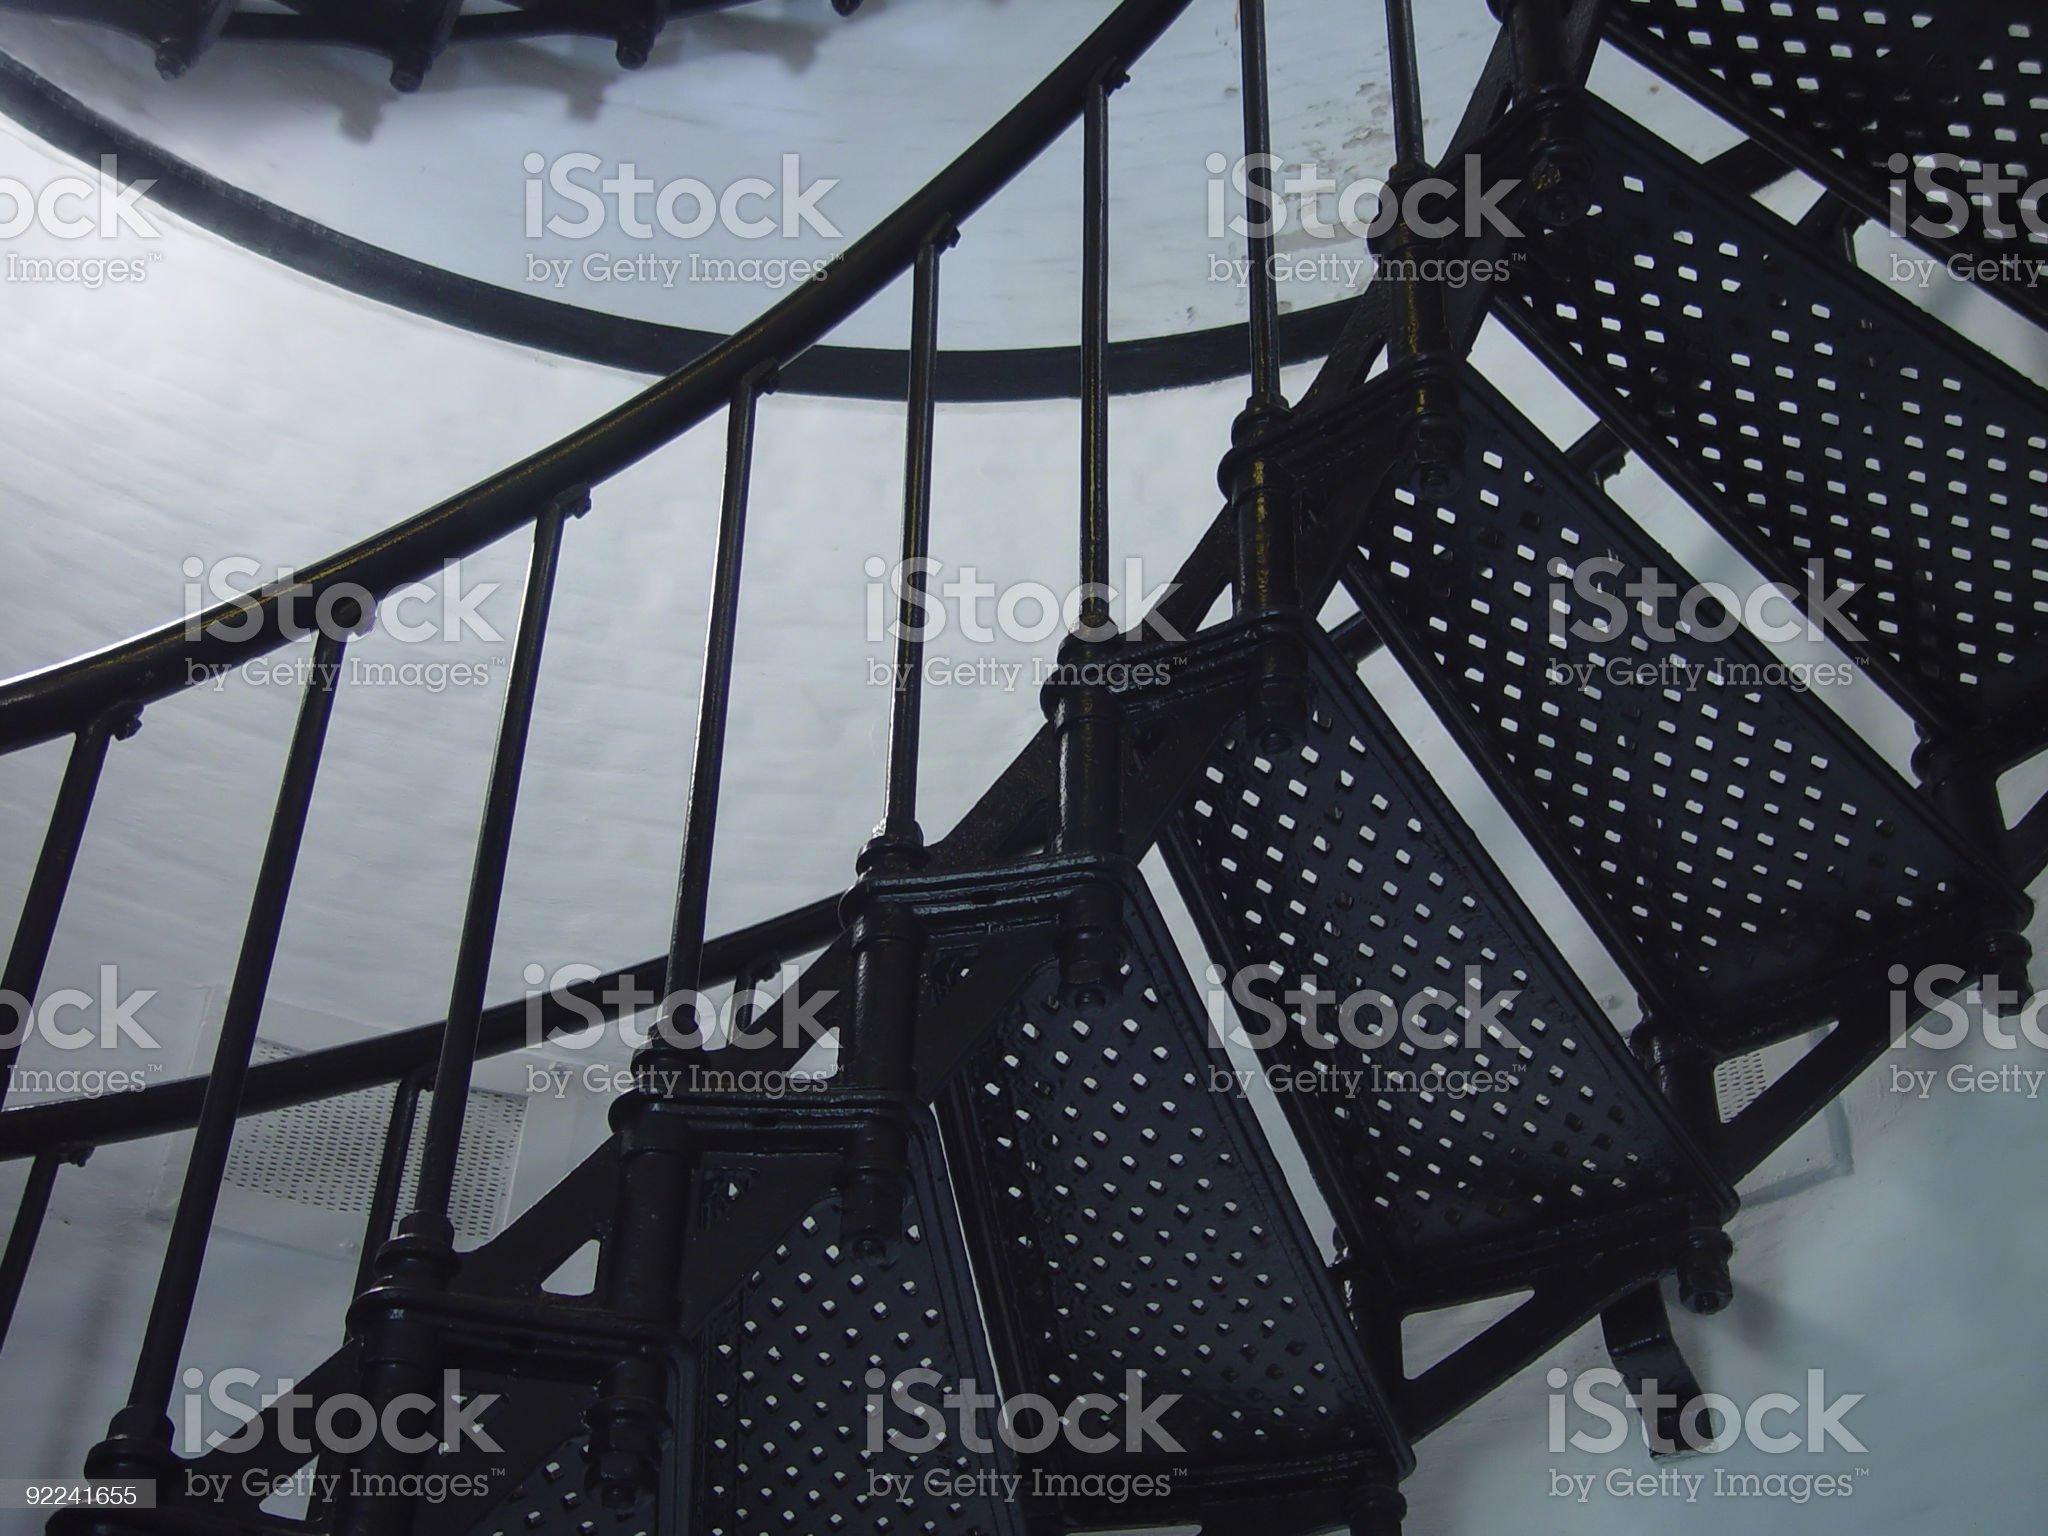 Stair Illusion royalty-free stock photo